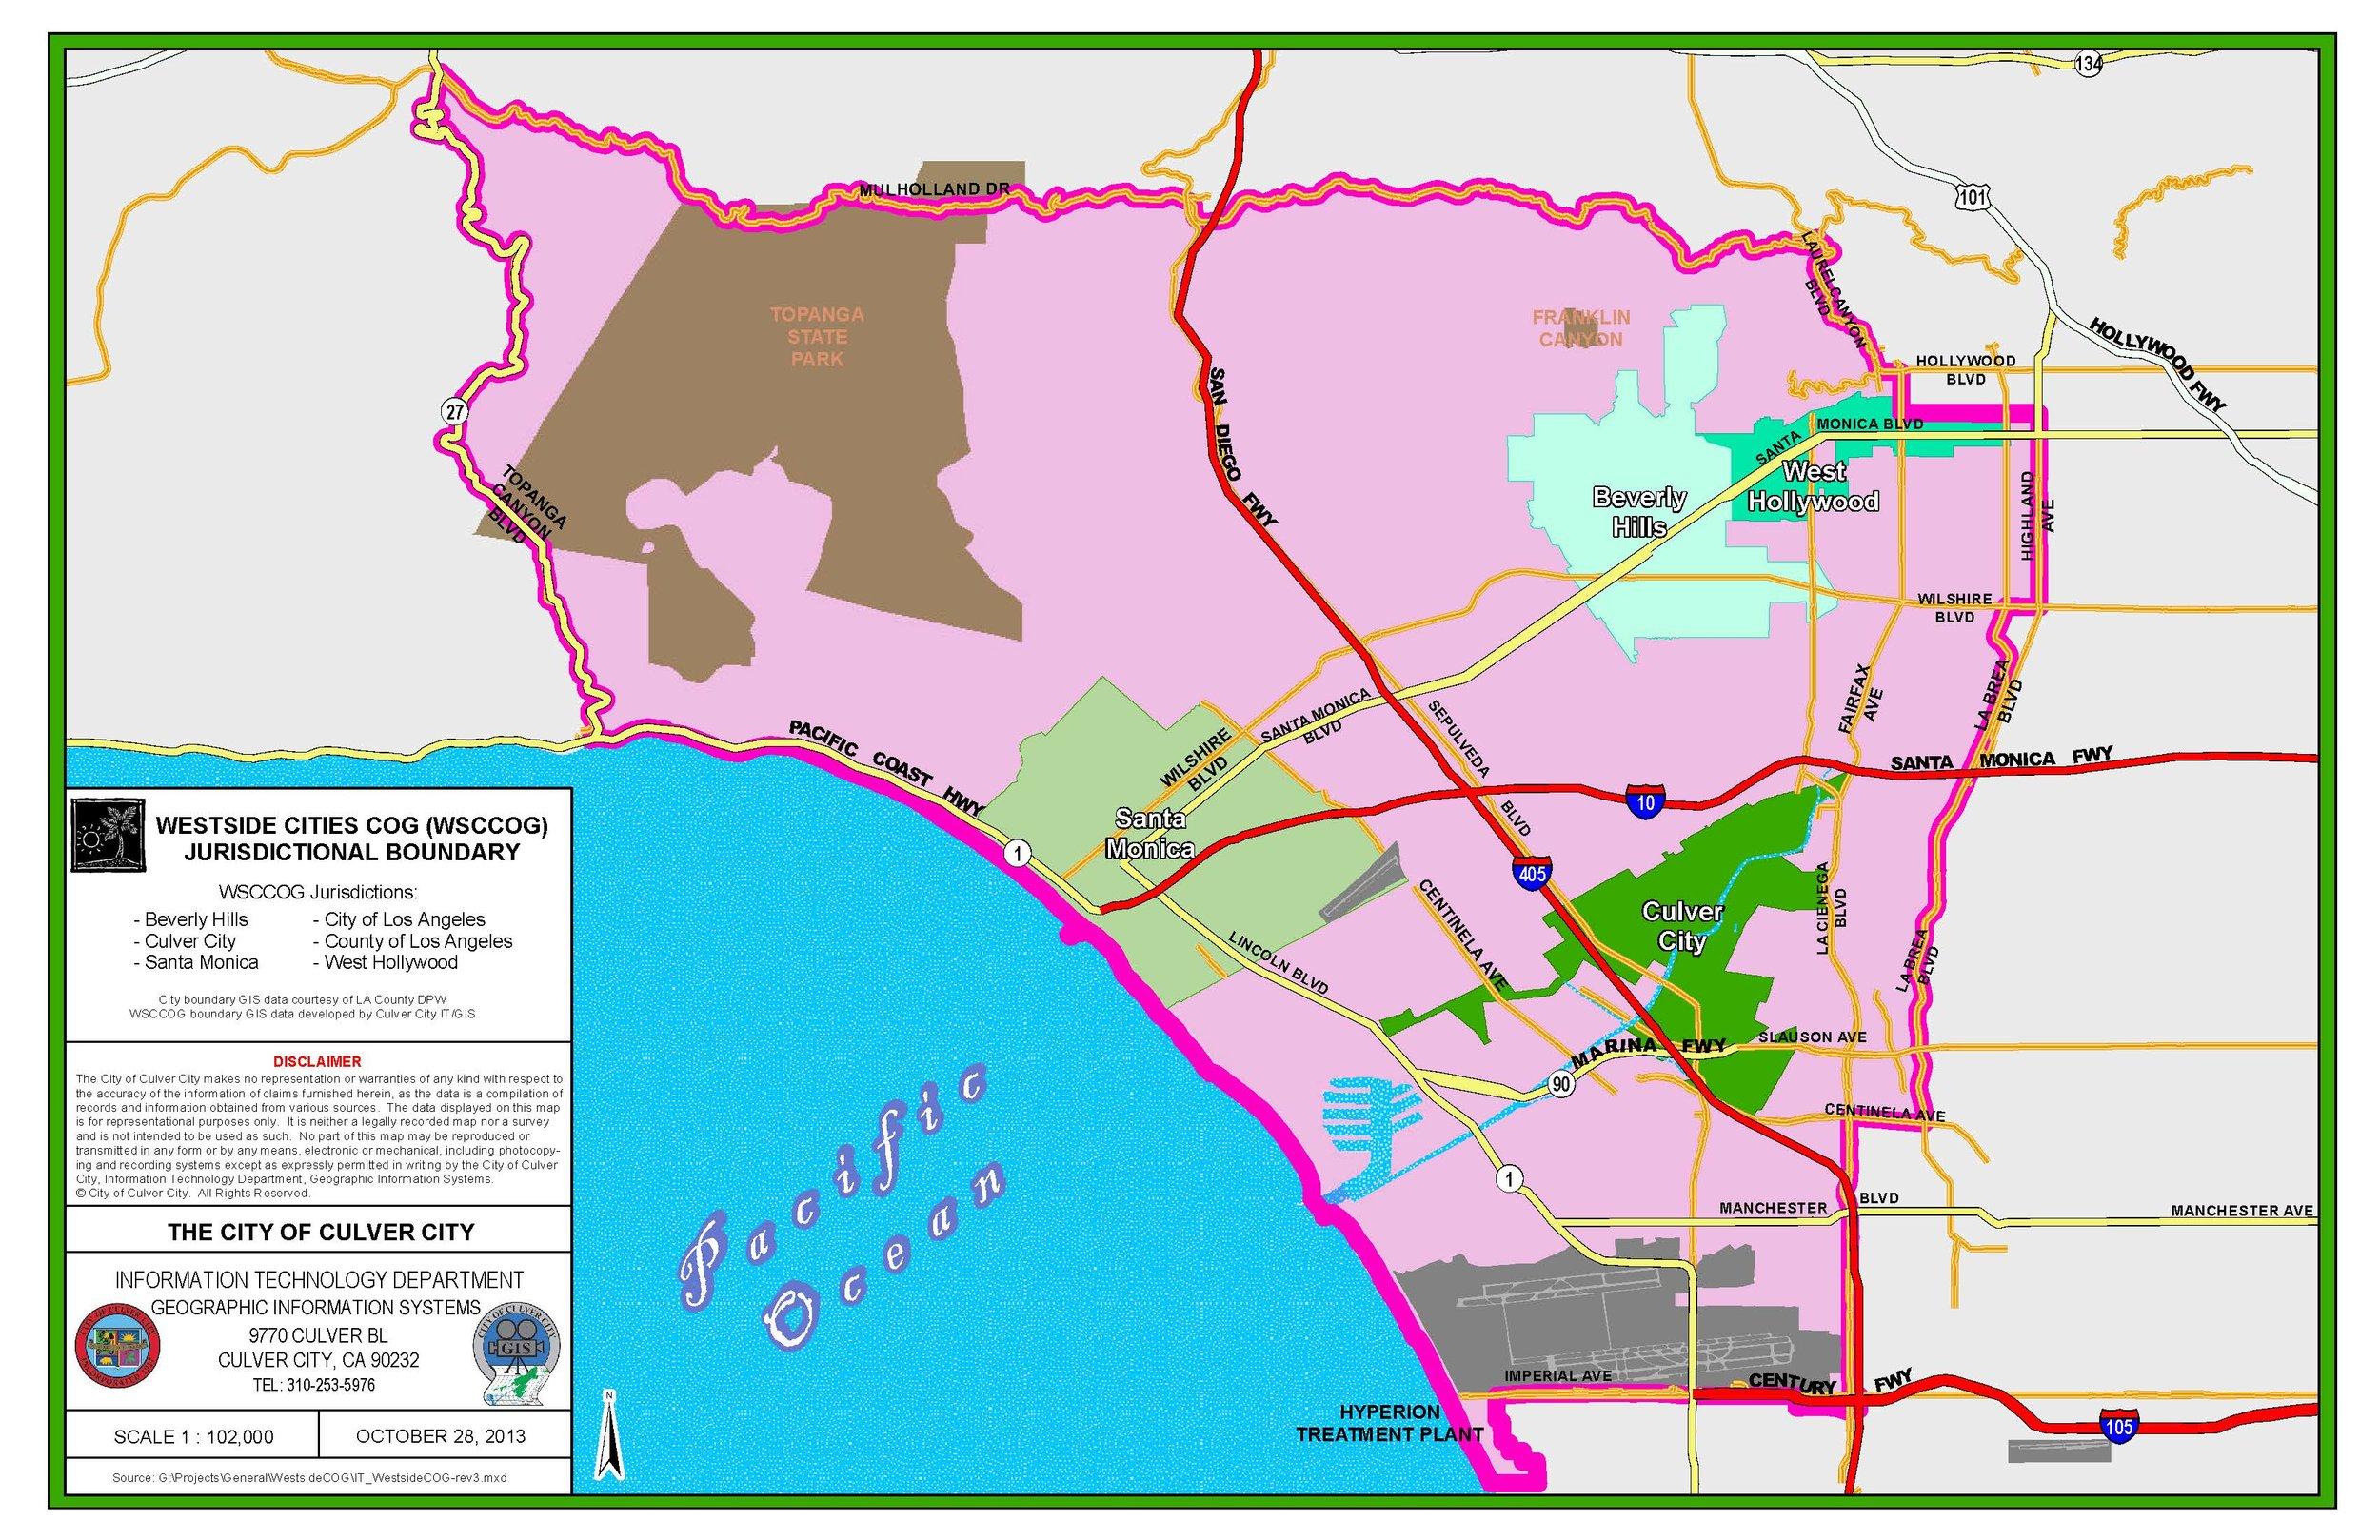 WSCCOG Boundary Map.jpg